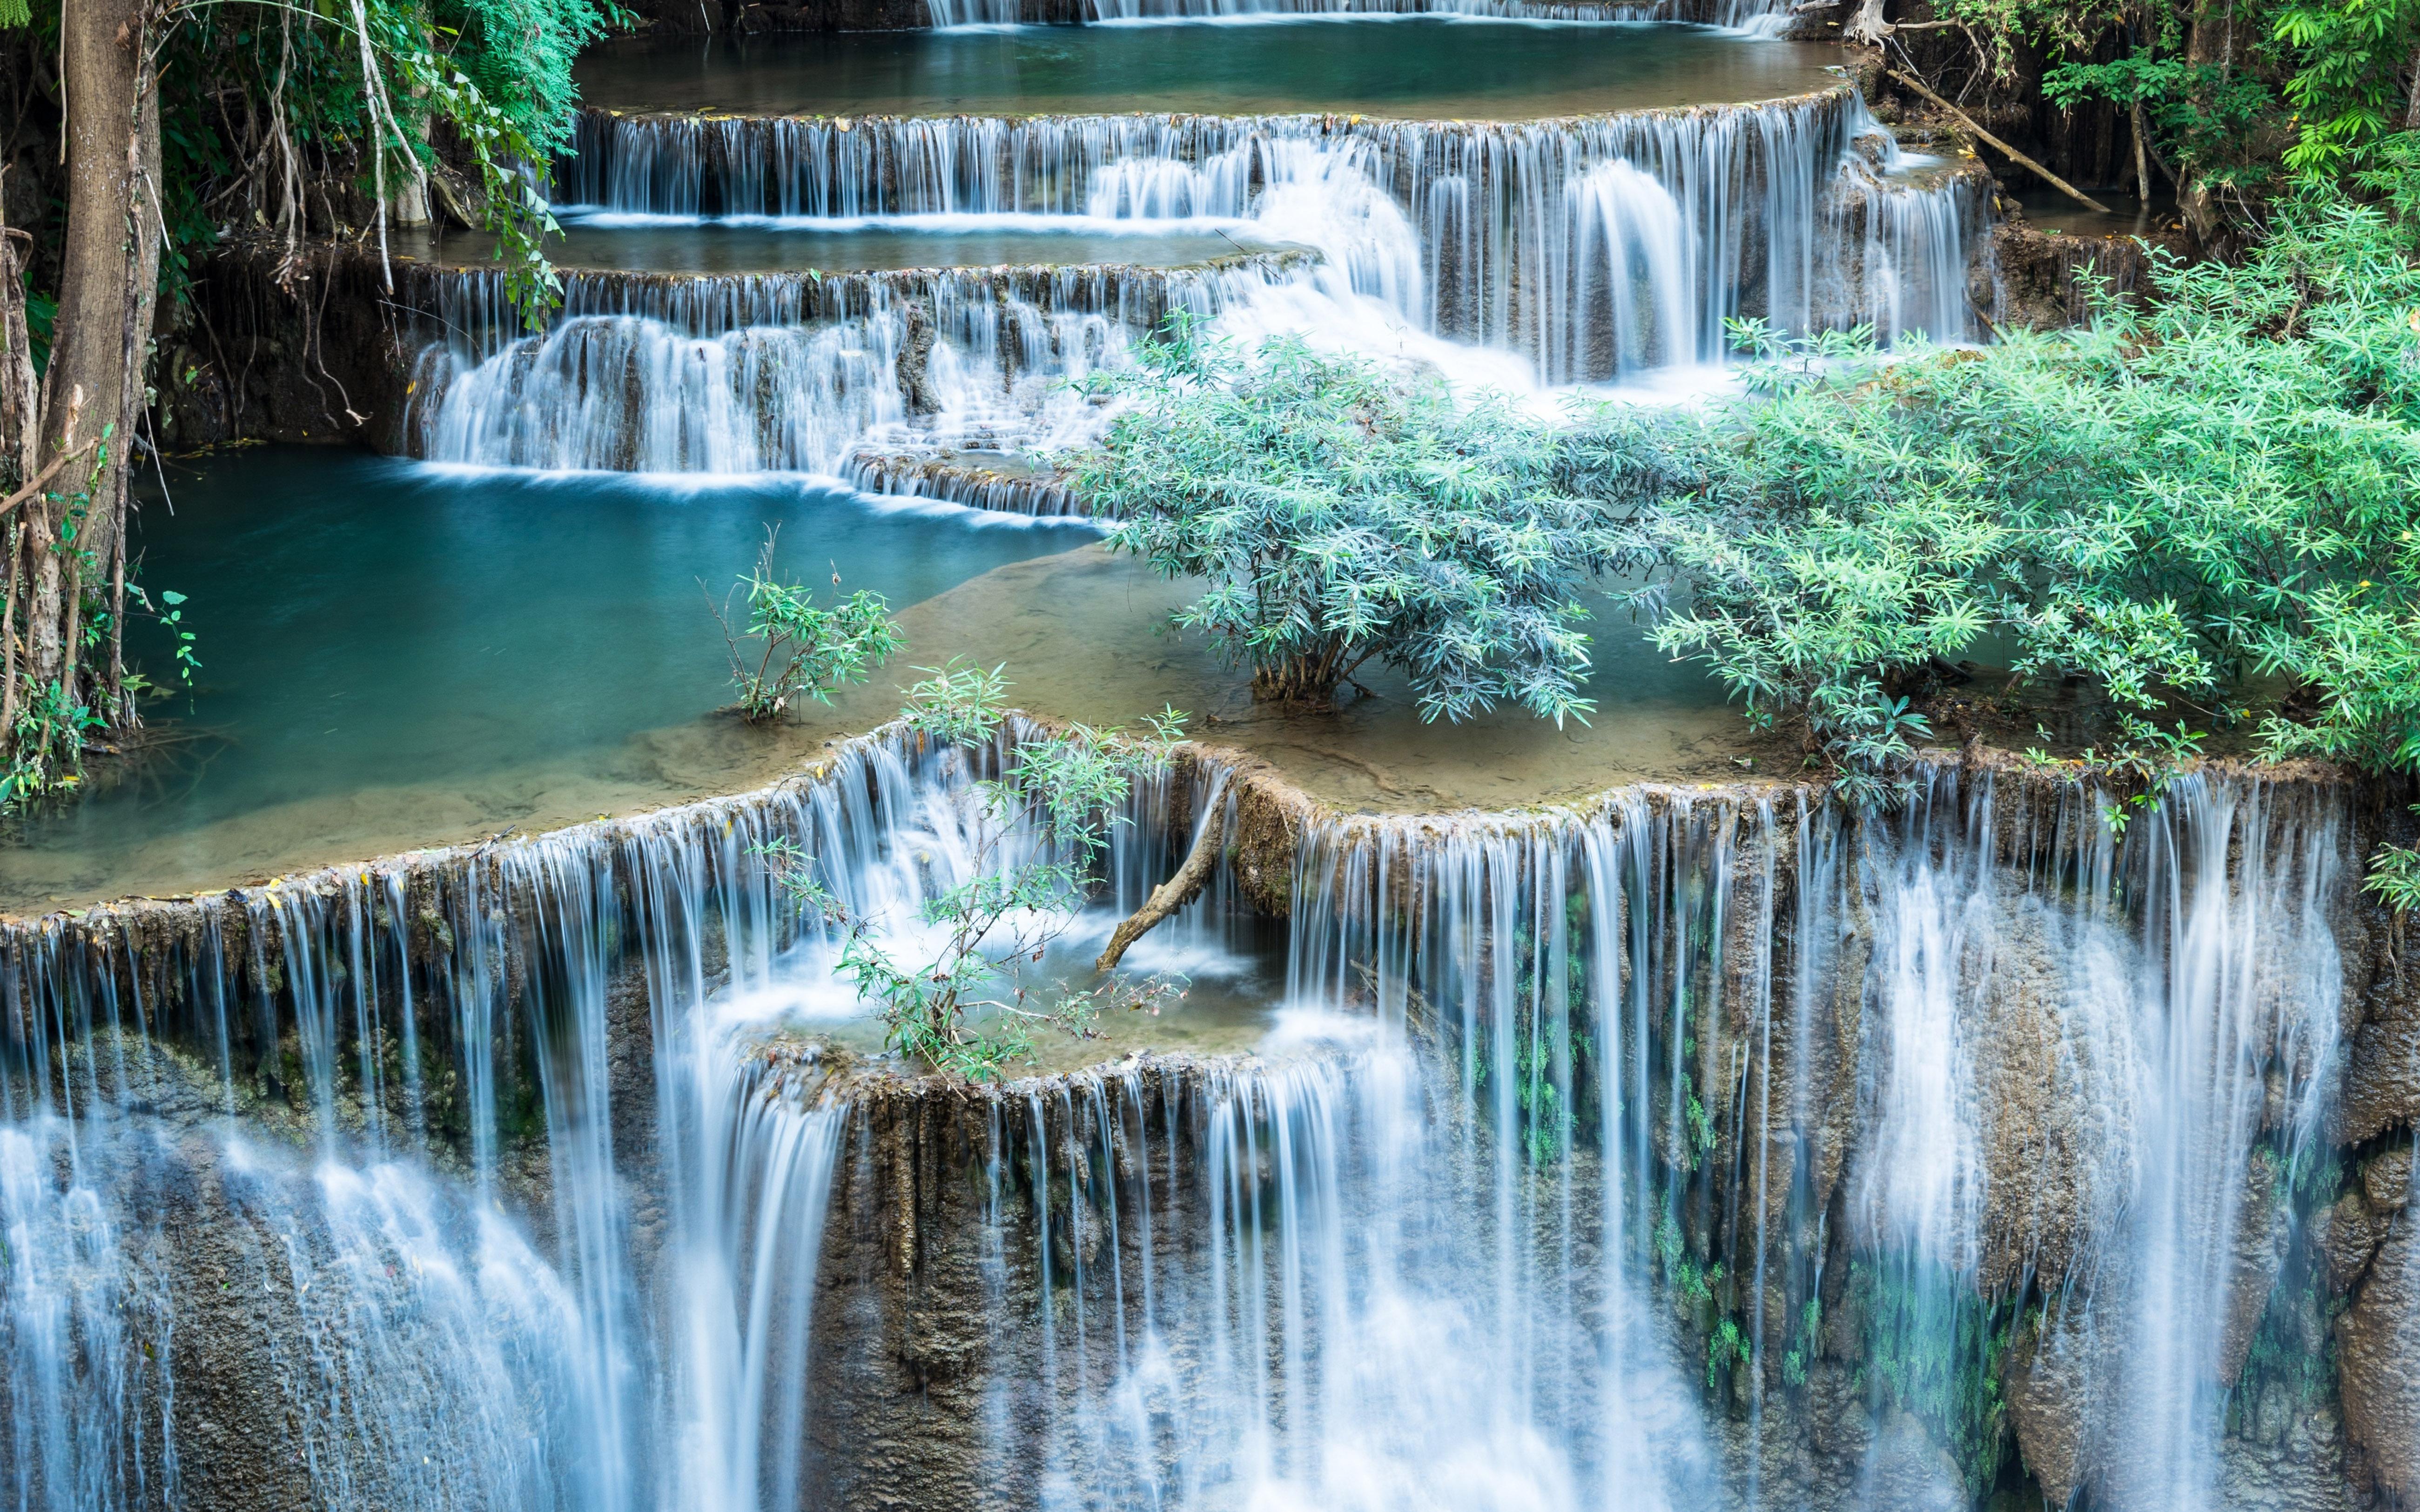 Falls Hd Wallpaper Free Download Lovely Cascading Waterfall With Green Shrub Desktop